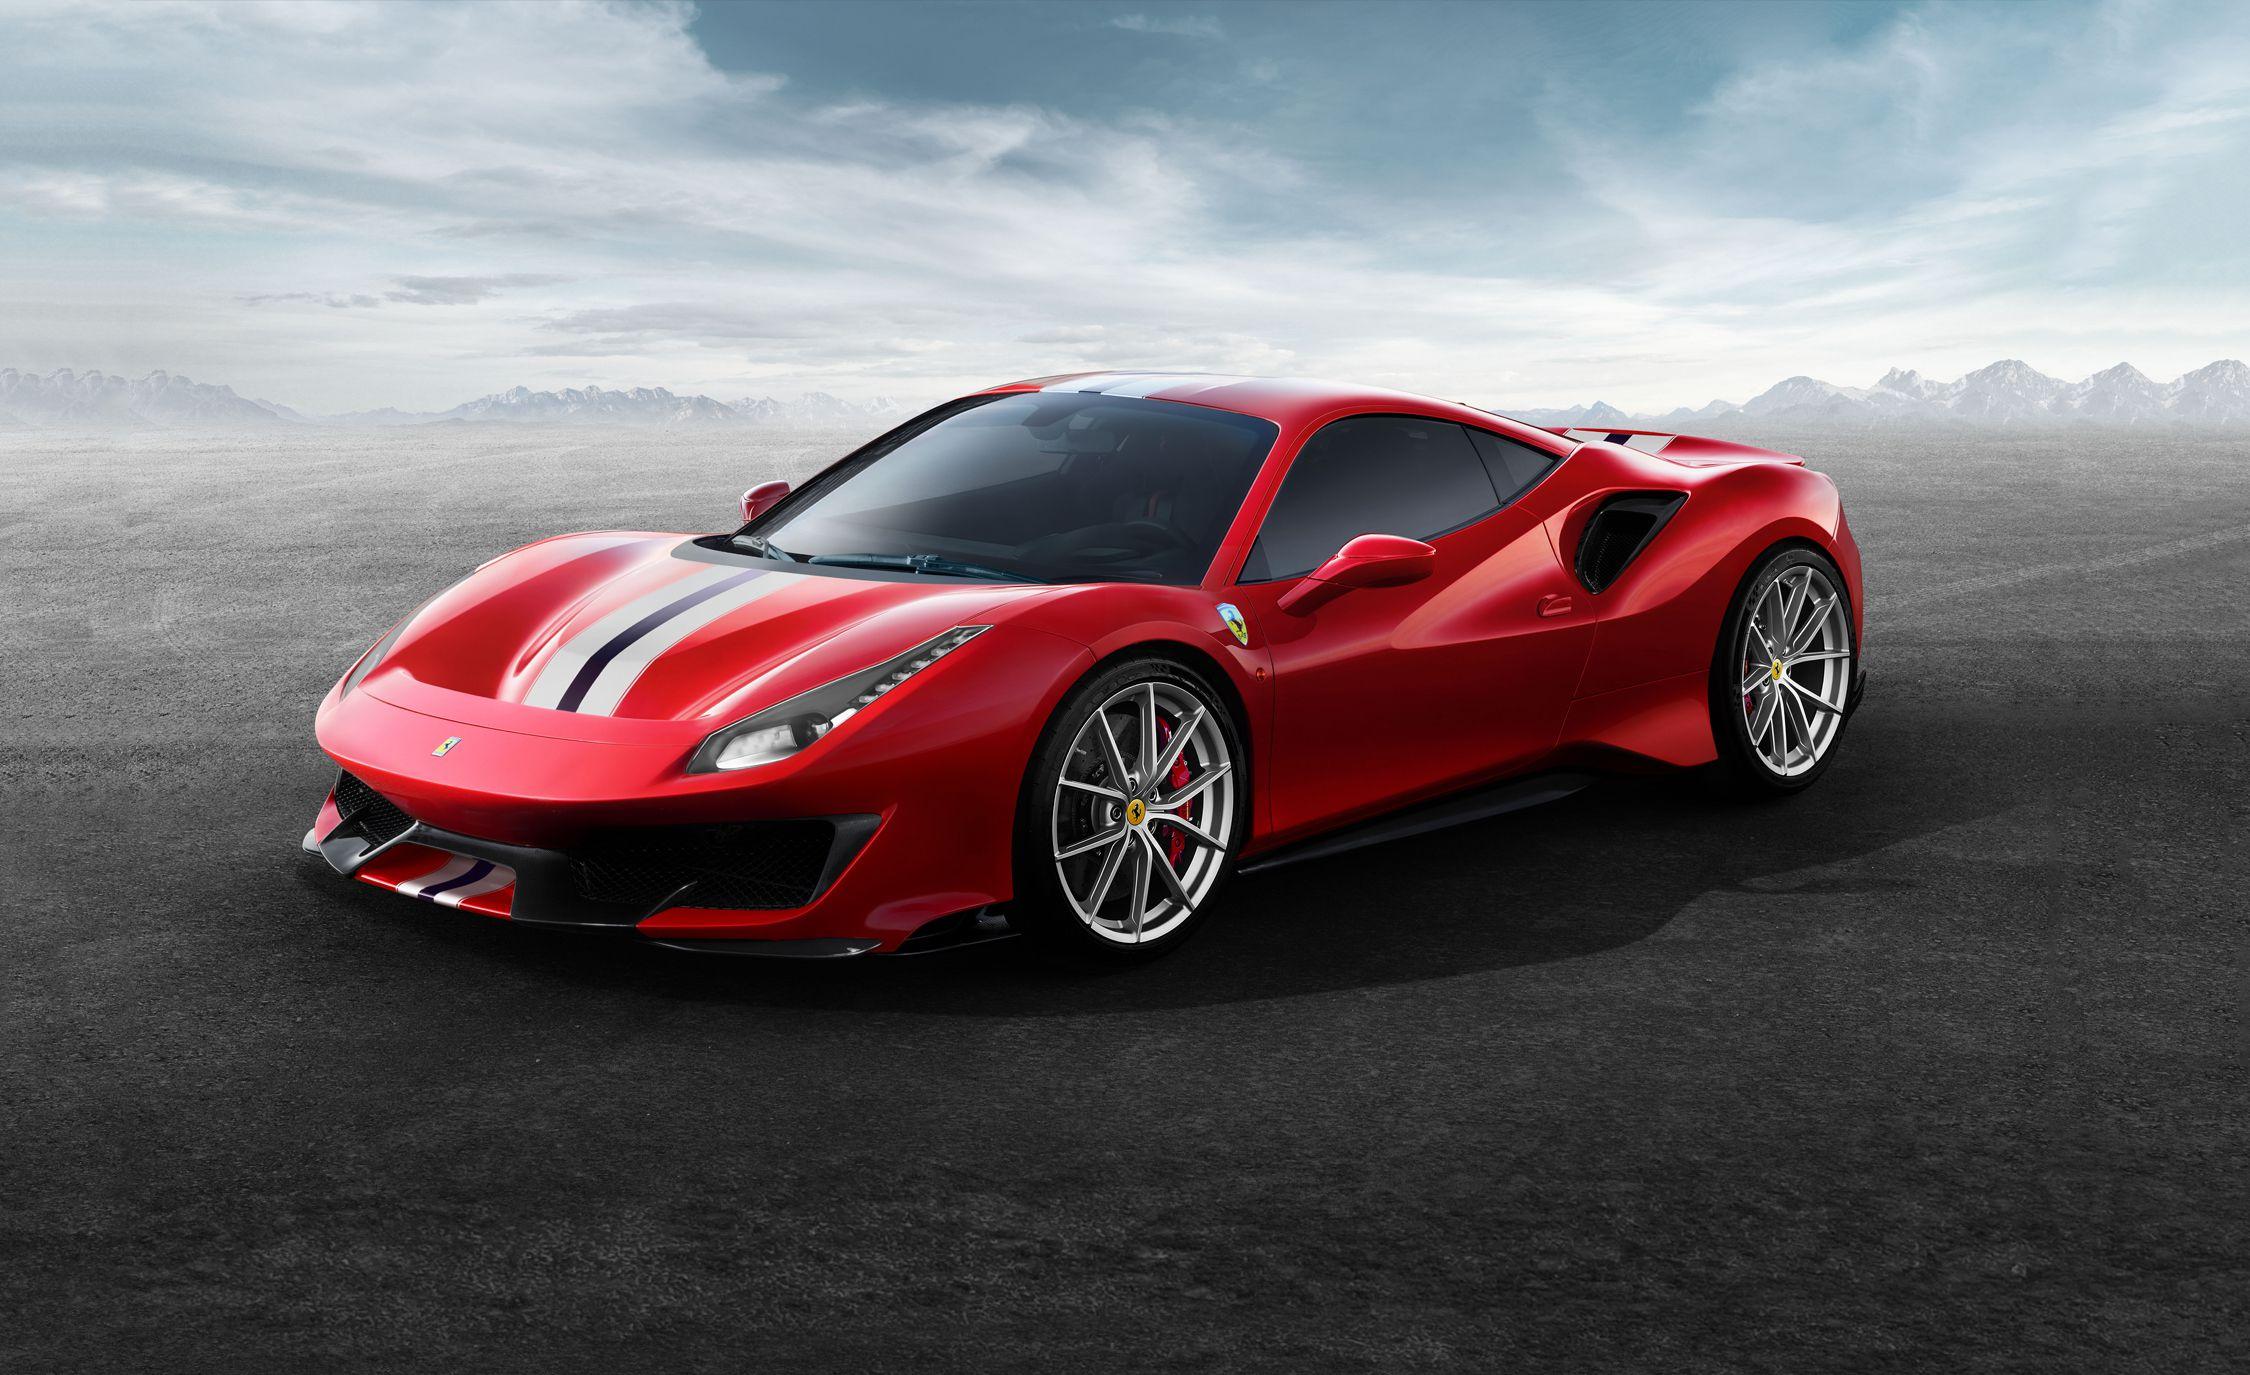 The Top 20 Ferrari Models Of All Time Moneyinc Com >> The History And Evolution Of The Ferrari 488